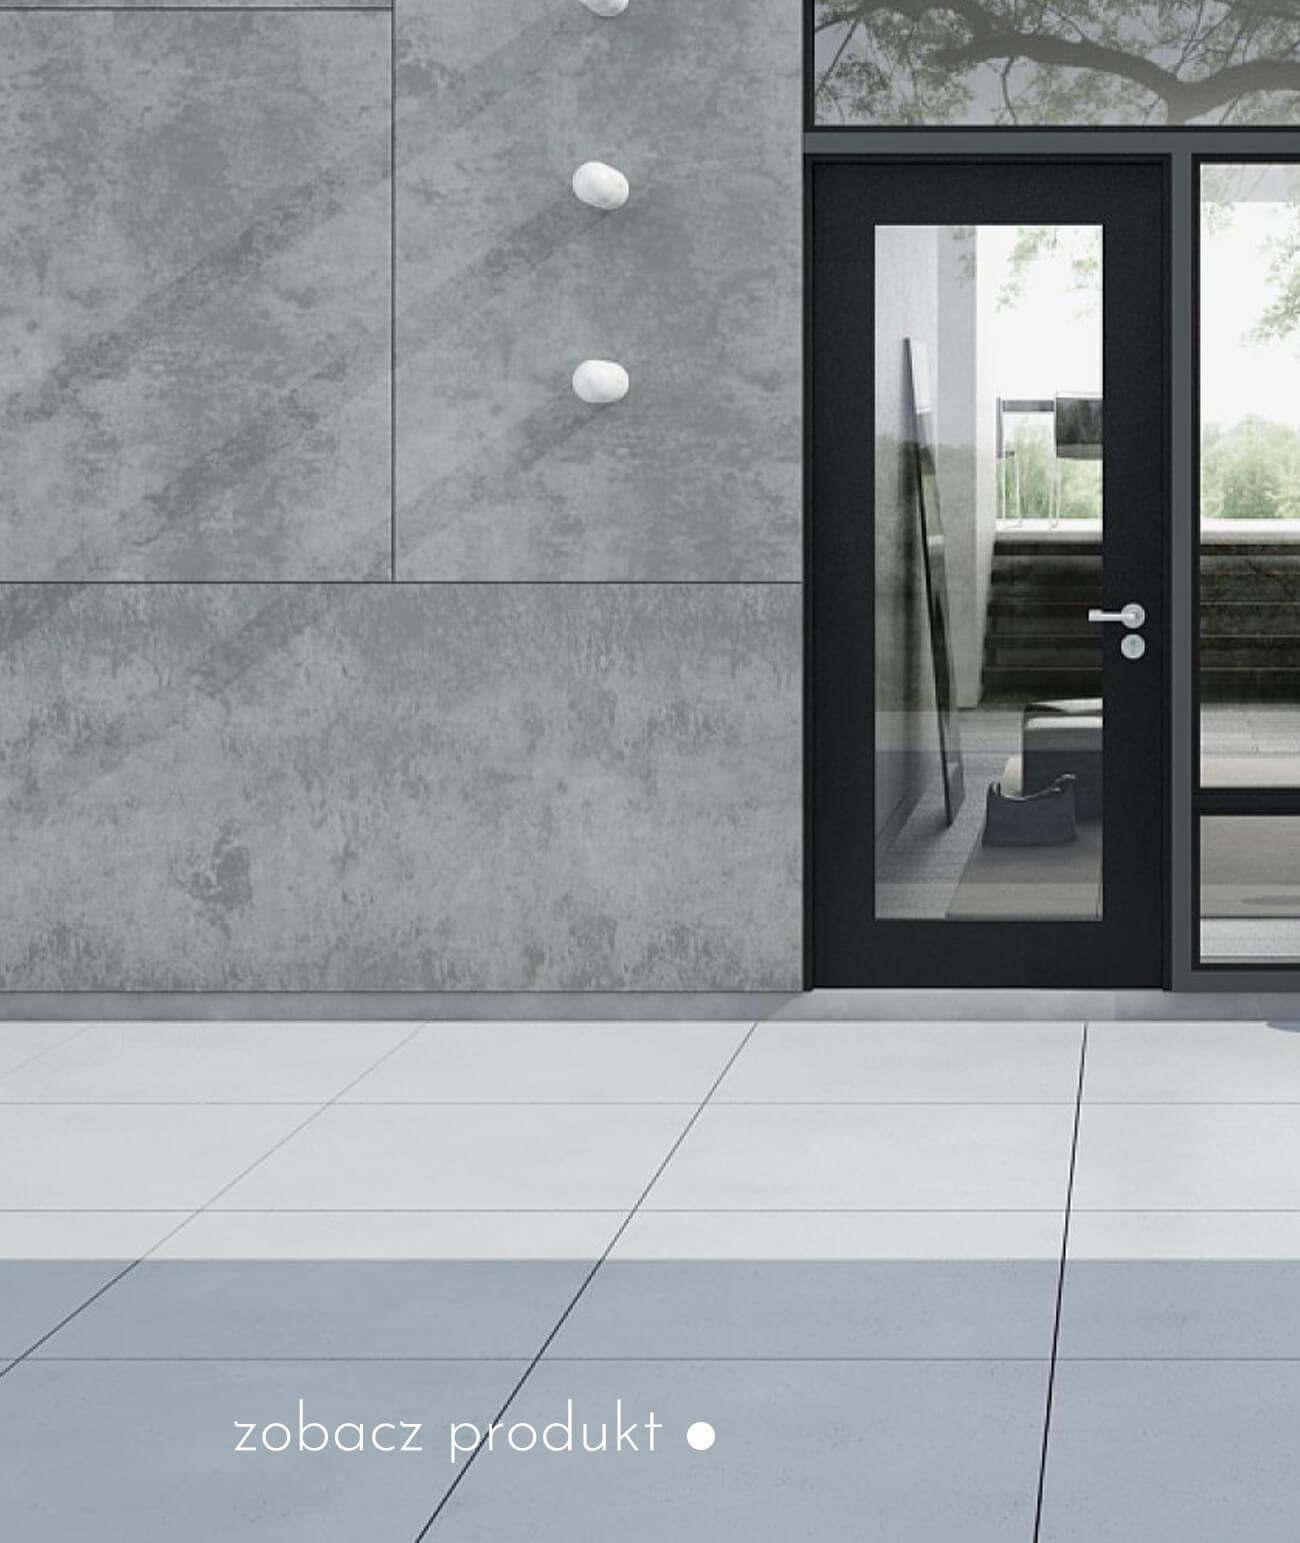 betonowe-plyty-podlogowe-i-tarasowe-beton-architektoniczny_1046-23051-s50-jasny-szary-mysi---betonowa-plyta-podlogowa-i-tarasowa-beton-architektoniczny